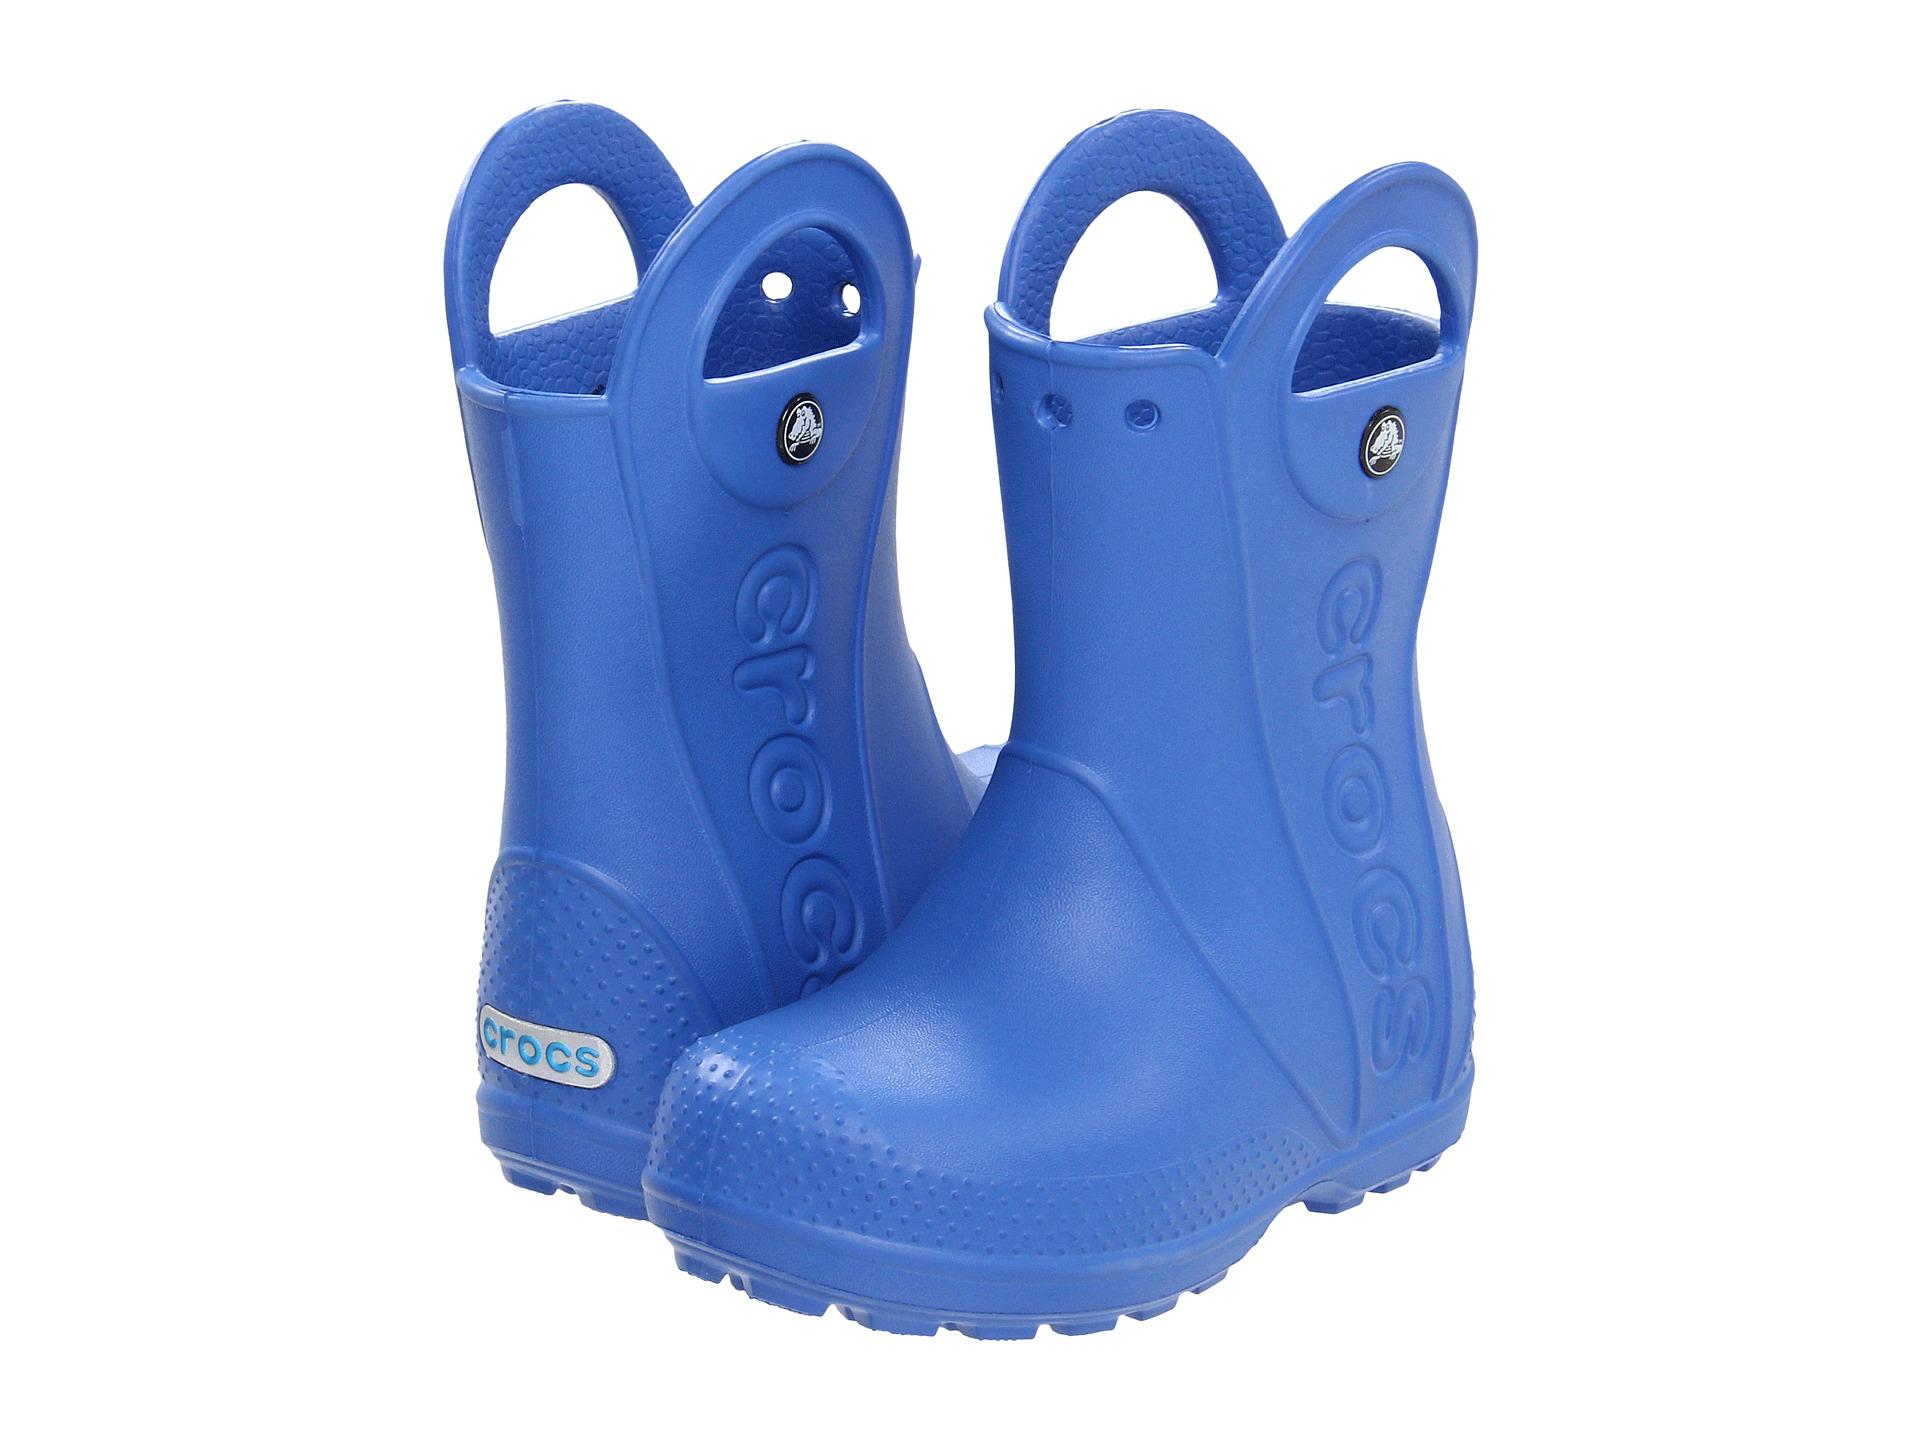 Crocs Kids Handle It Rain Boot Toddler Little Kid At